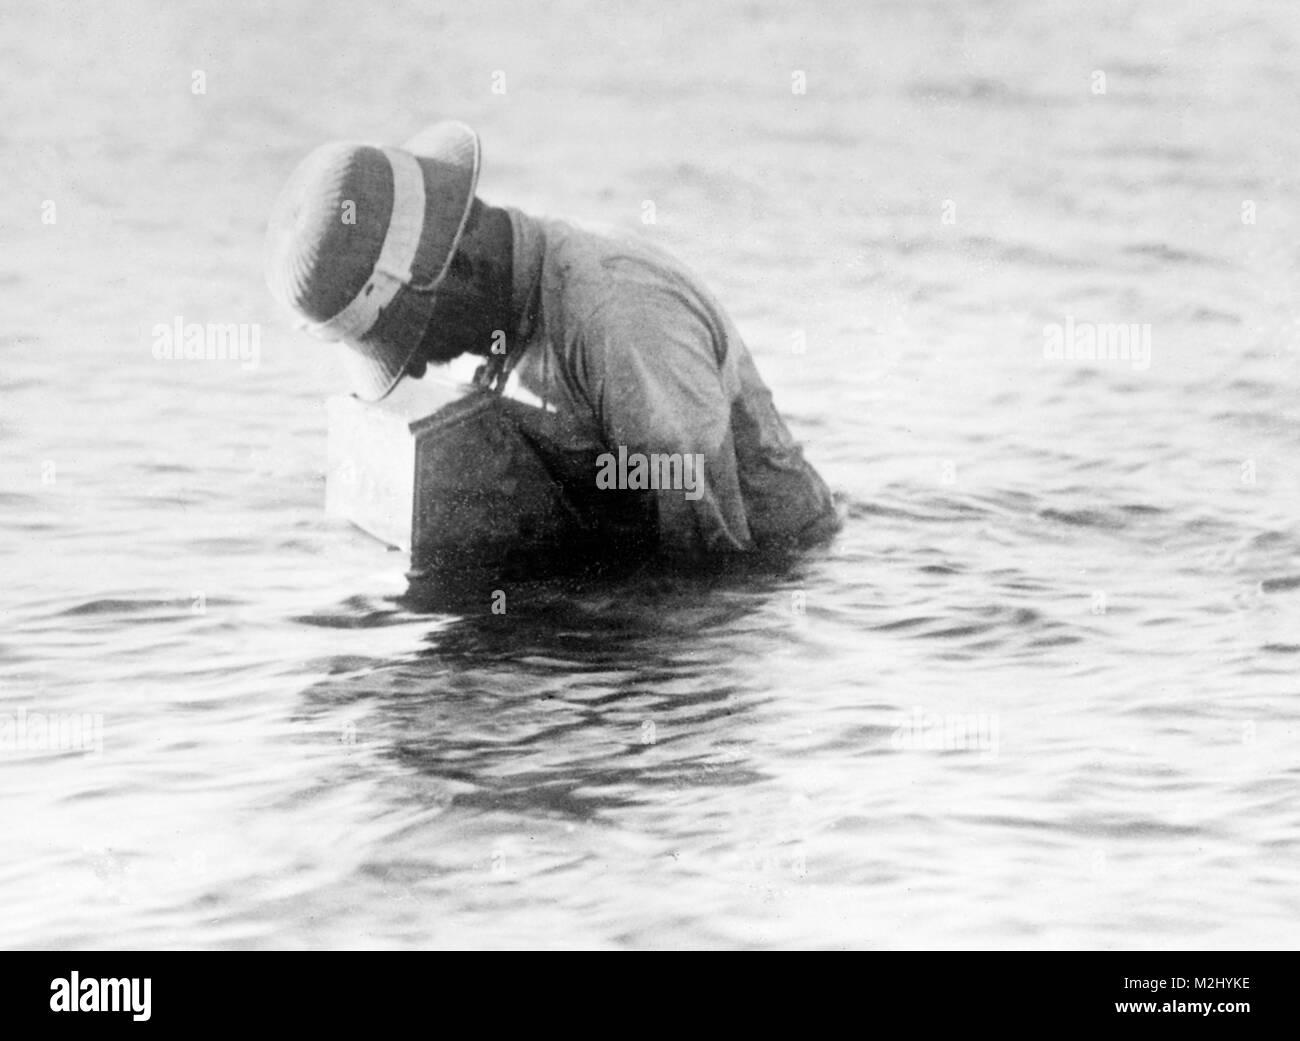 Reighard Sub-aquatic Camera, 1909 - Stock Image